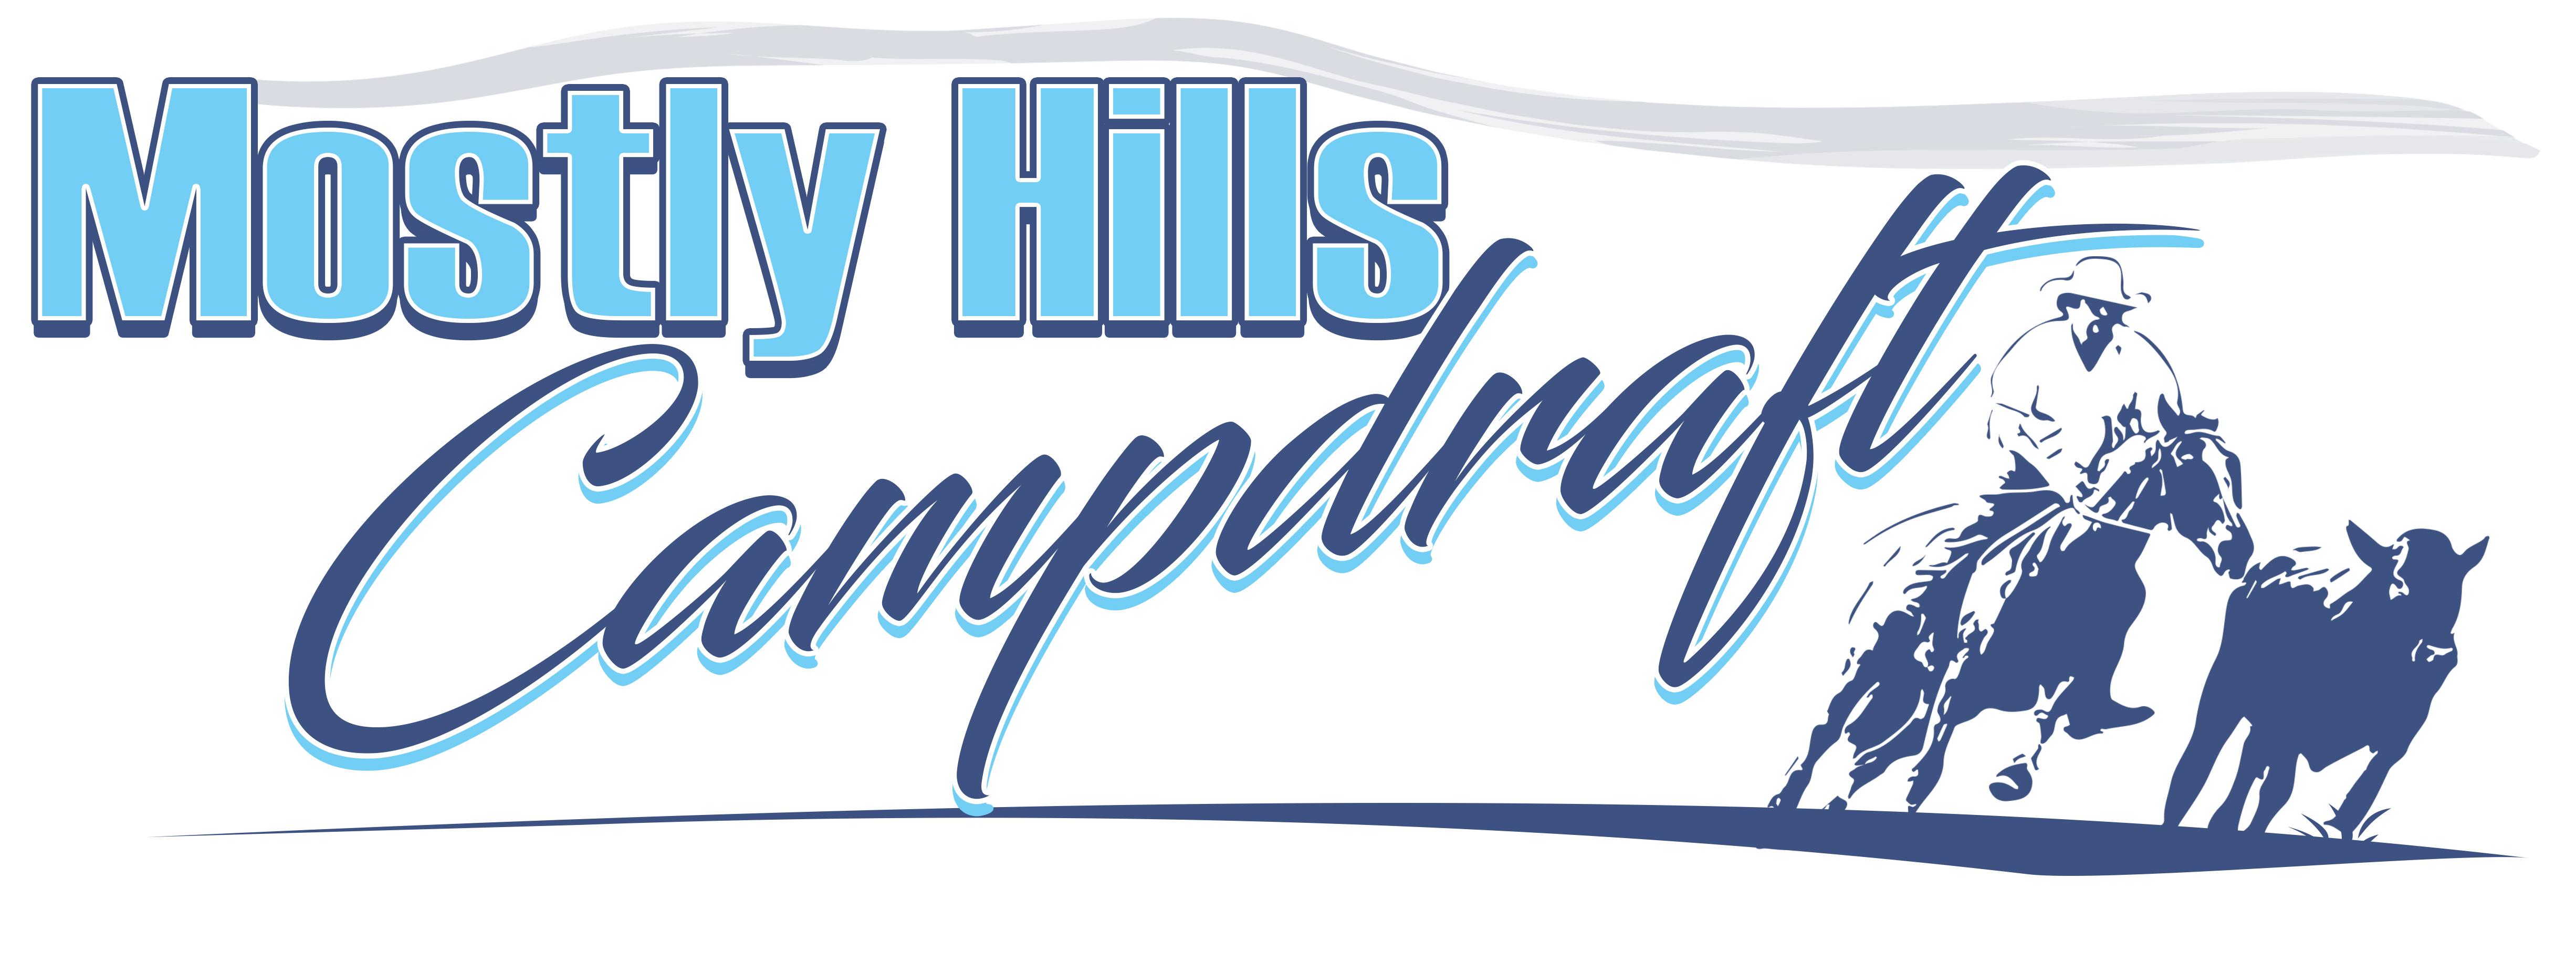 Mostly Hills Blue